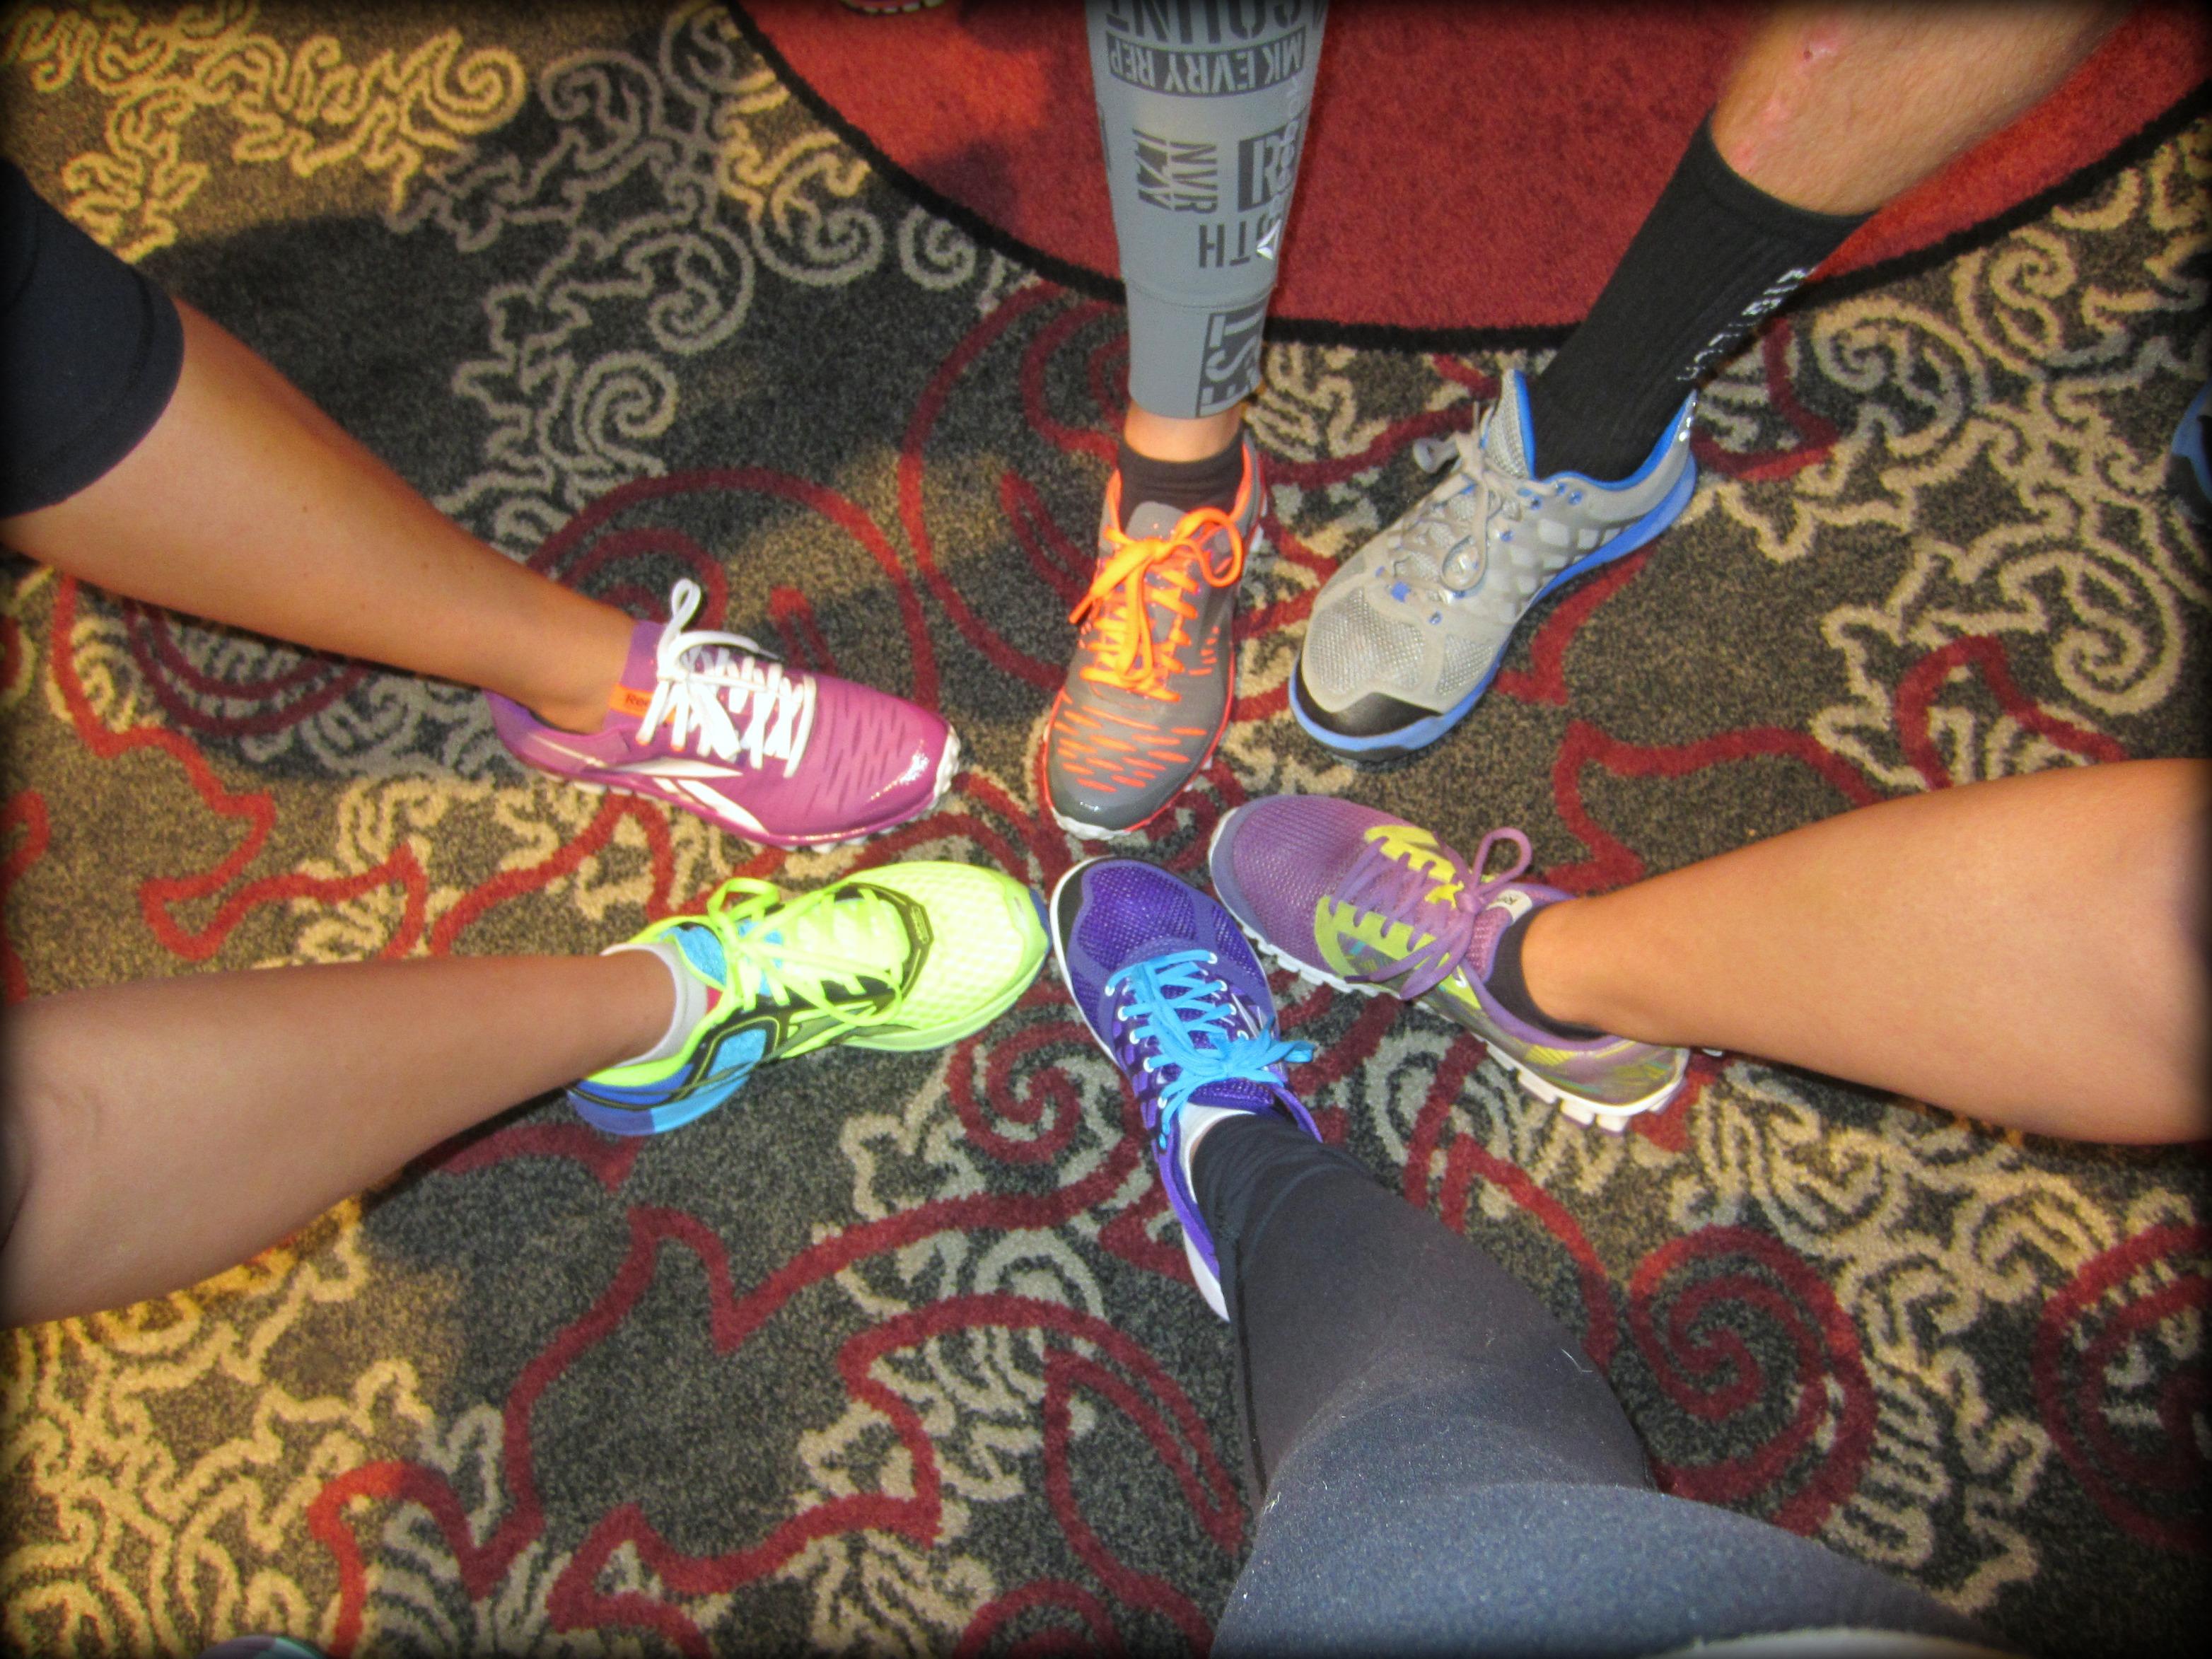 Reebok shoes at FitBloggin 13